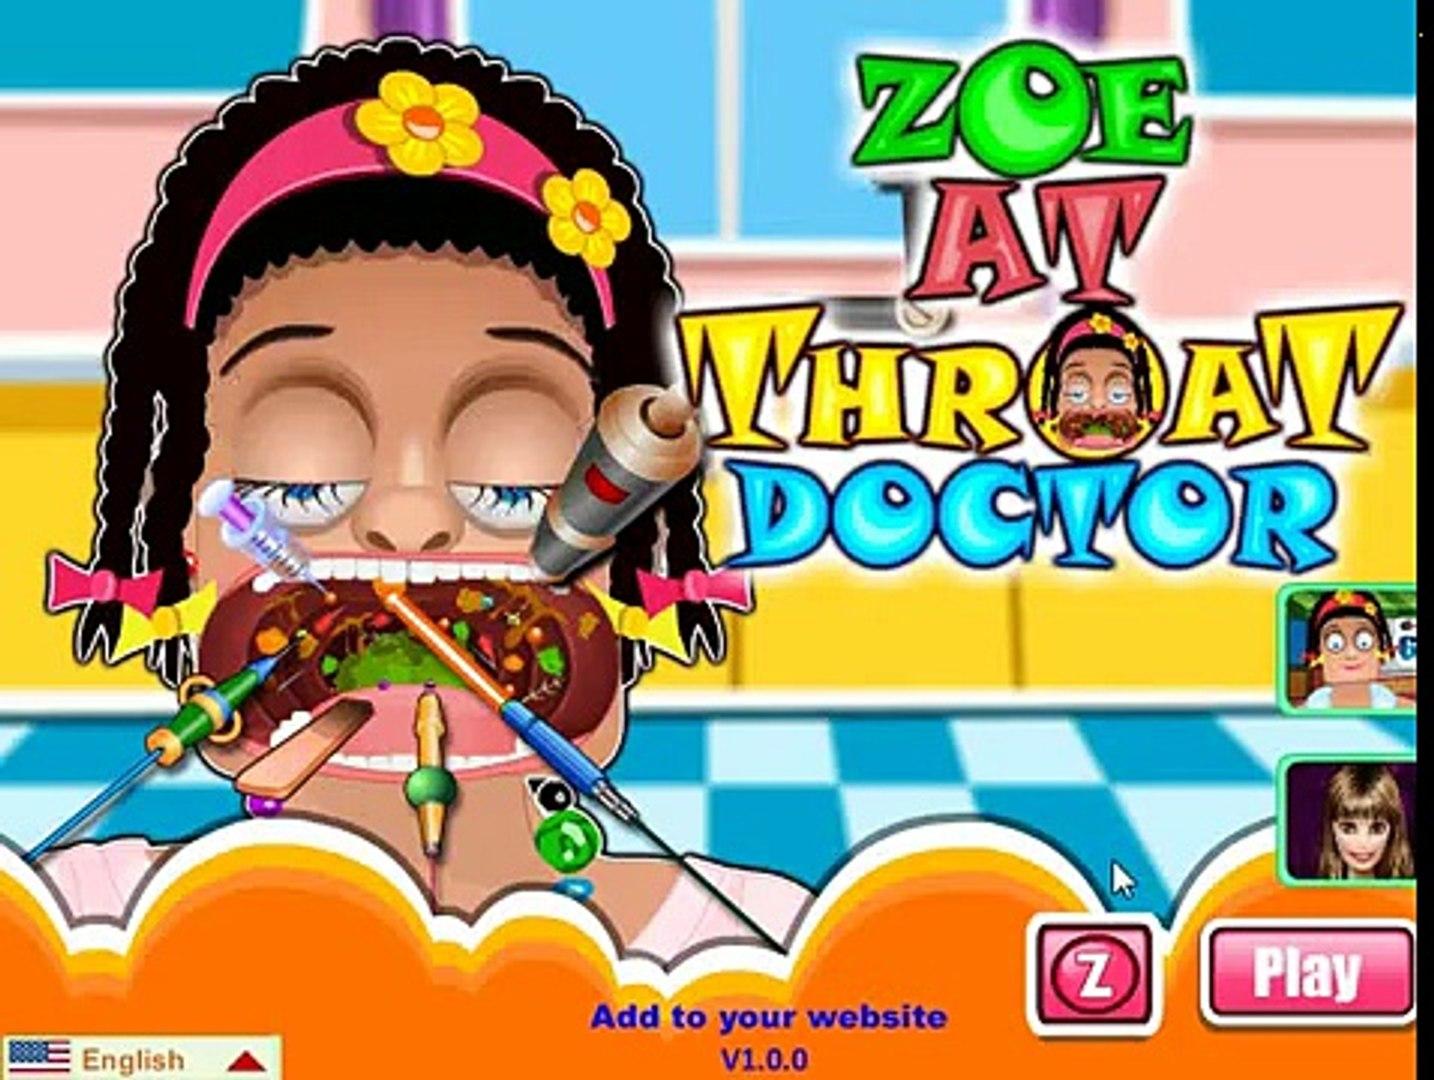 Мультик: Zoe At Throat Doctor / Зоя лечит горло у доктора